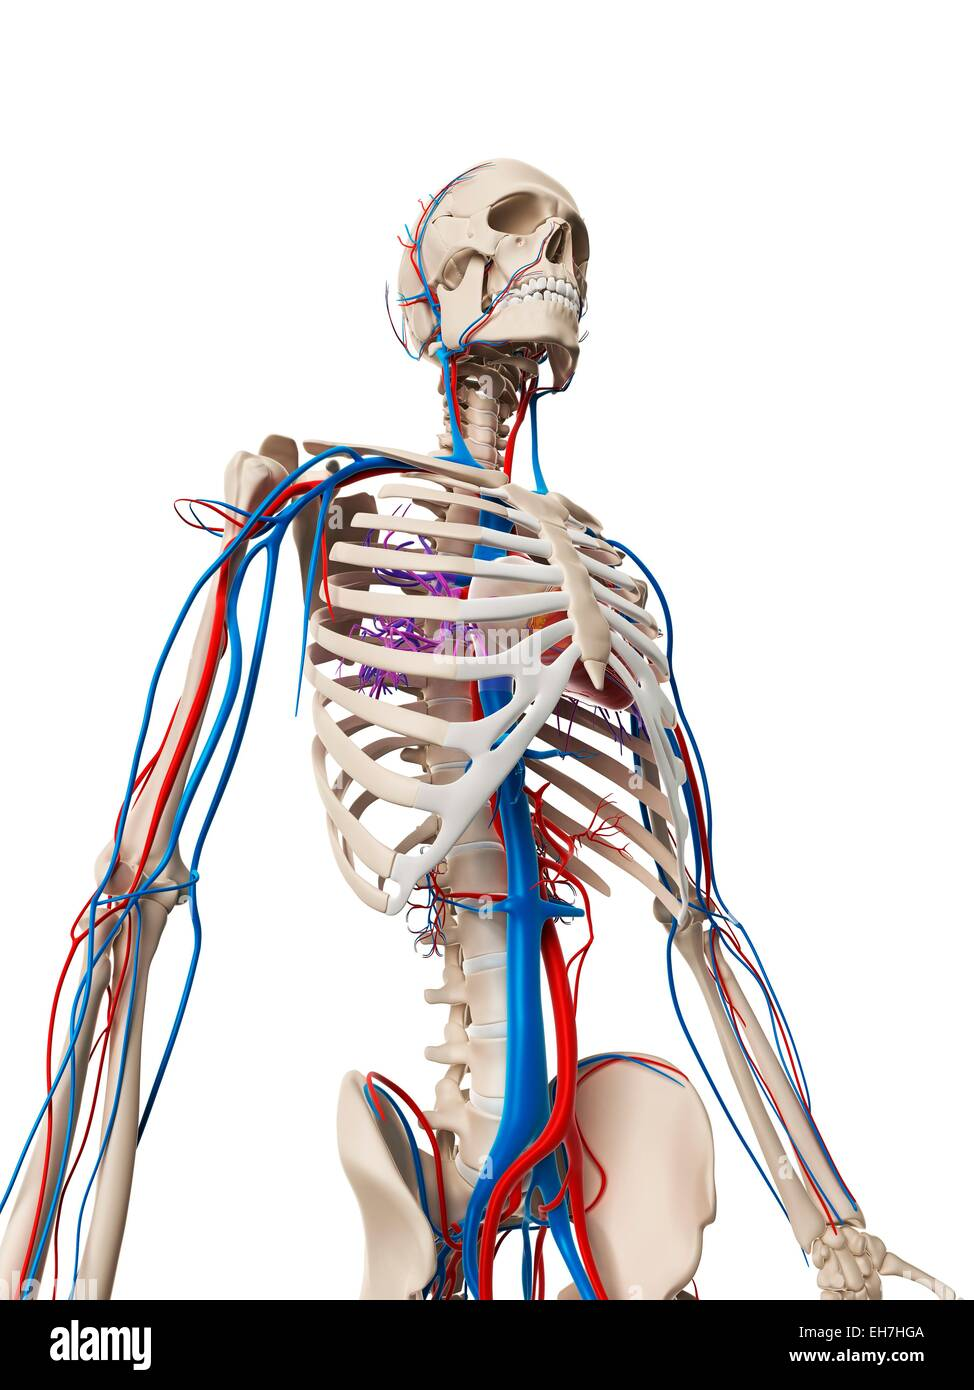 Human Vascular System Illustration Stock Photo 79458074 Alamy